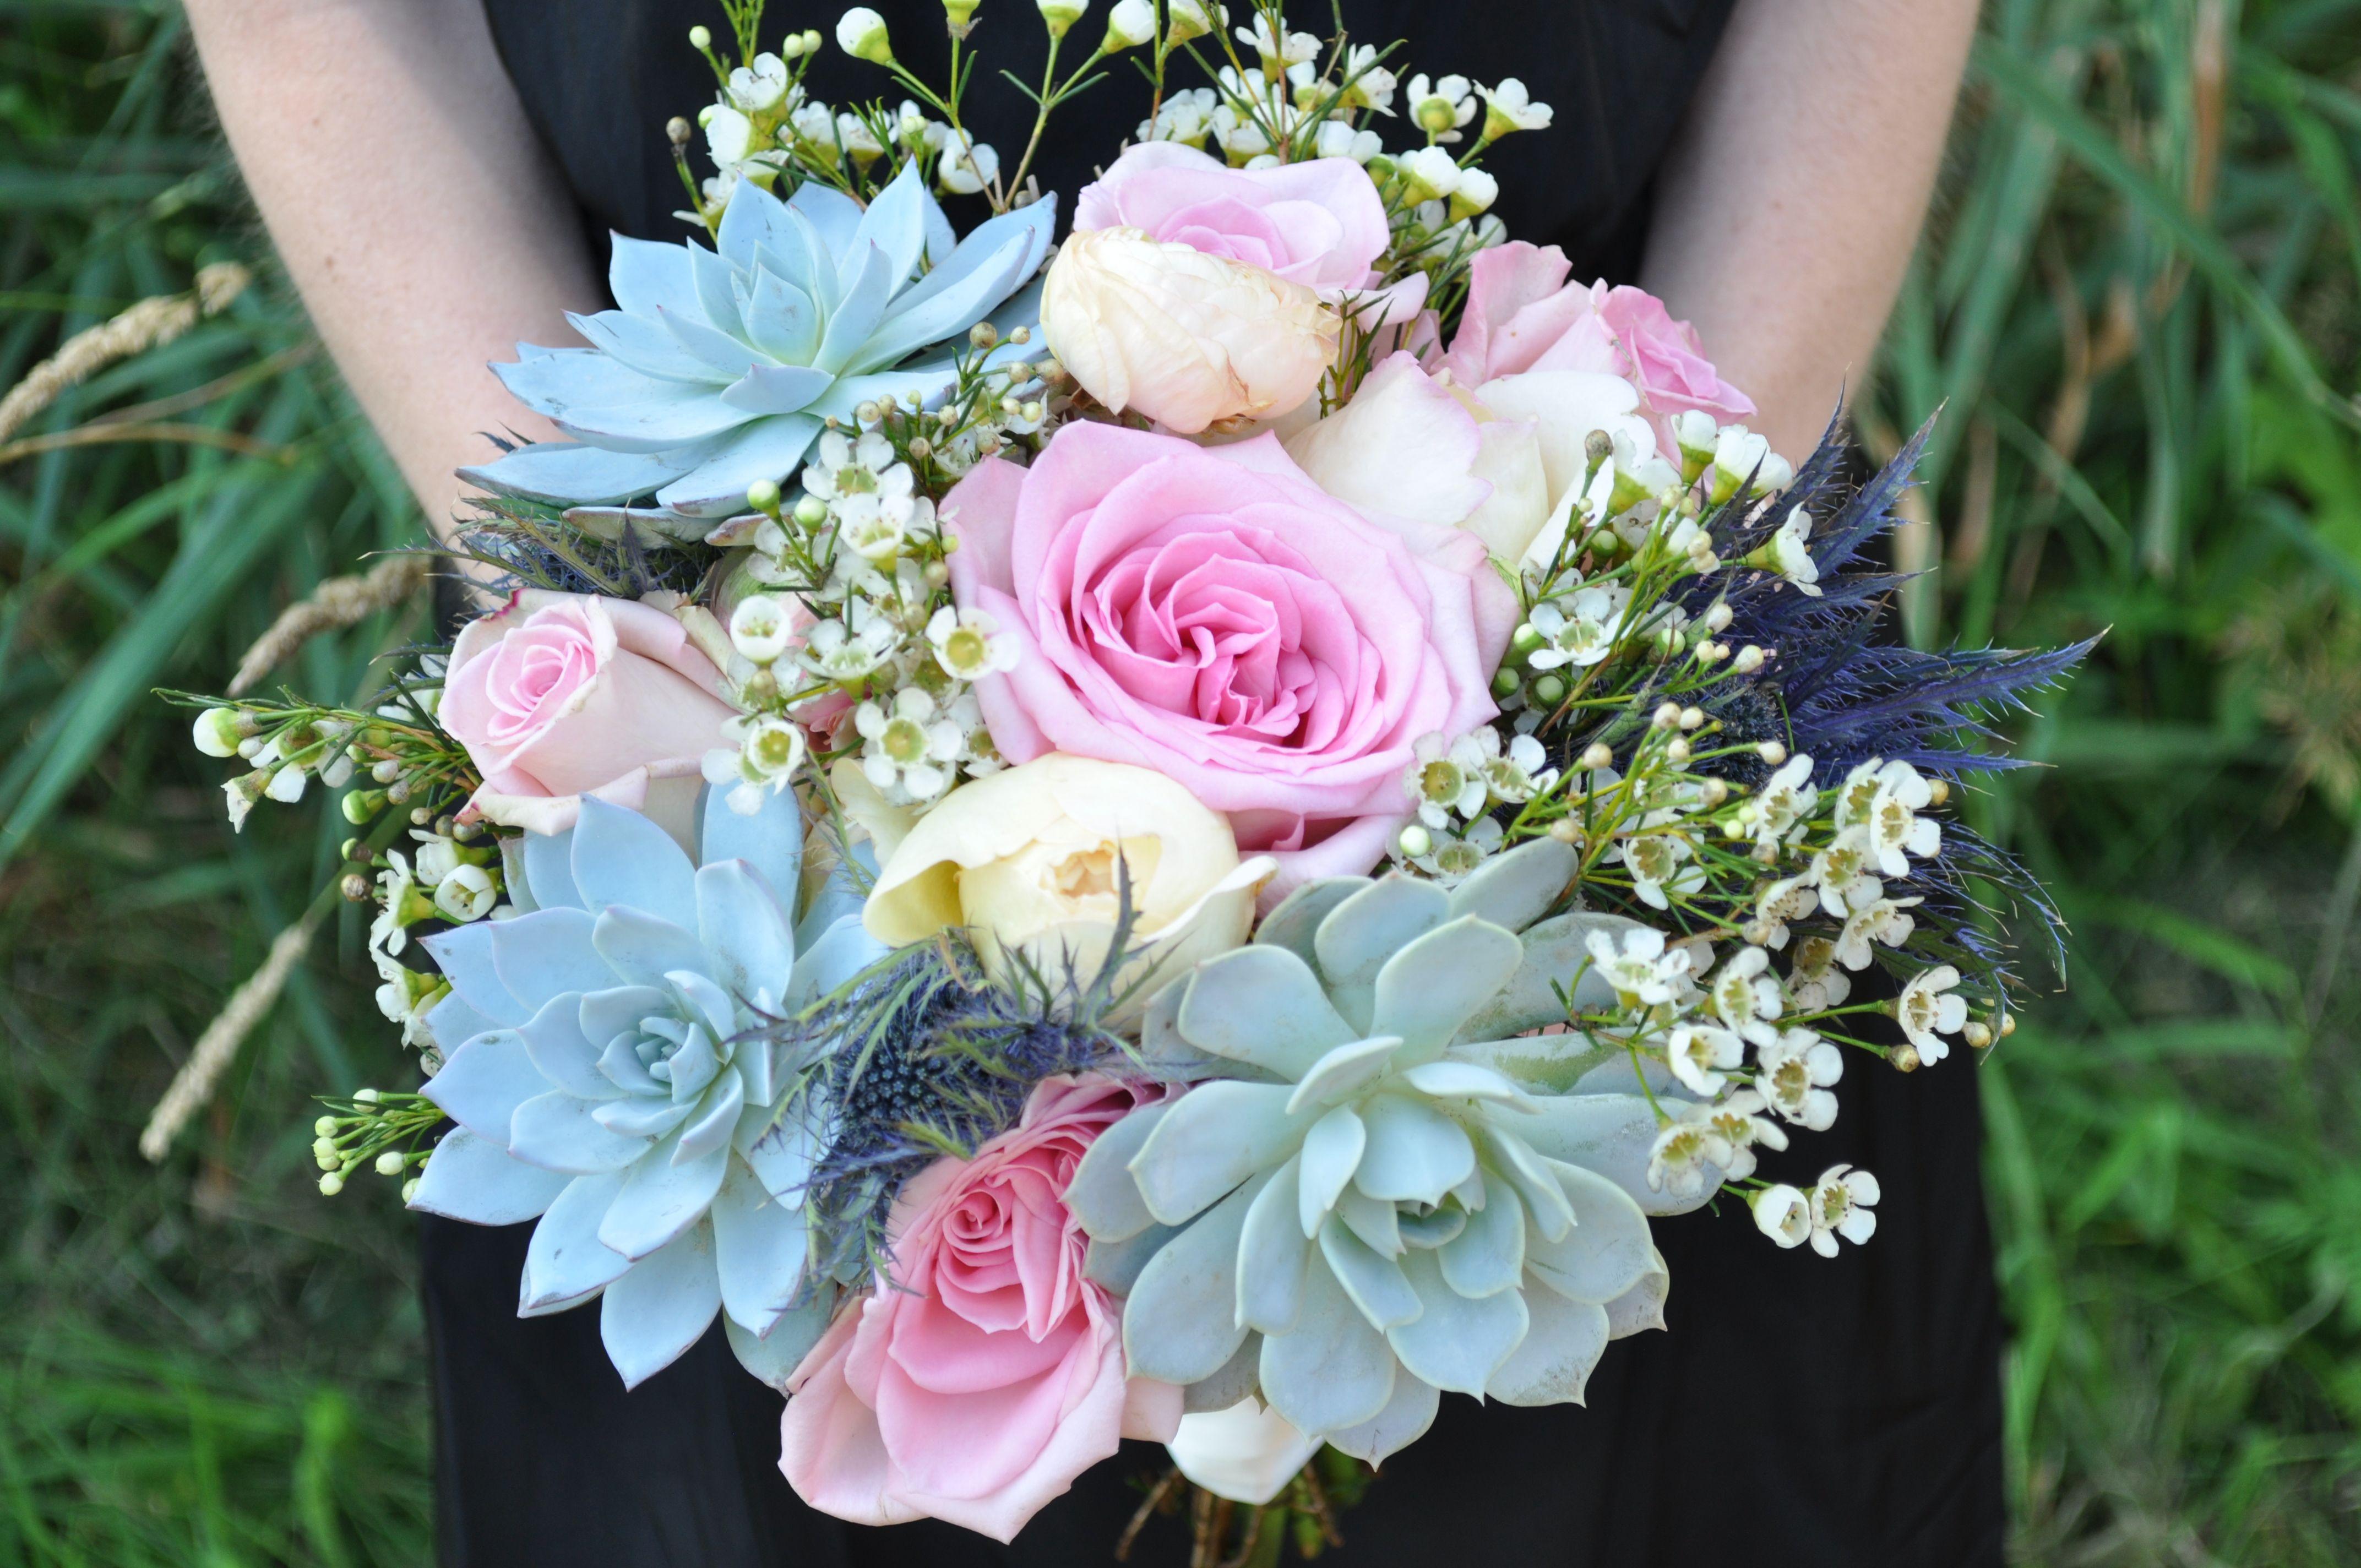 Httpsfacebookarrangedbymaddy succulent blue thistle flower bouquets httpsfacebookarrangedbymaddy succulent blue thistle izmirmasajfo